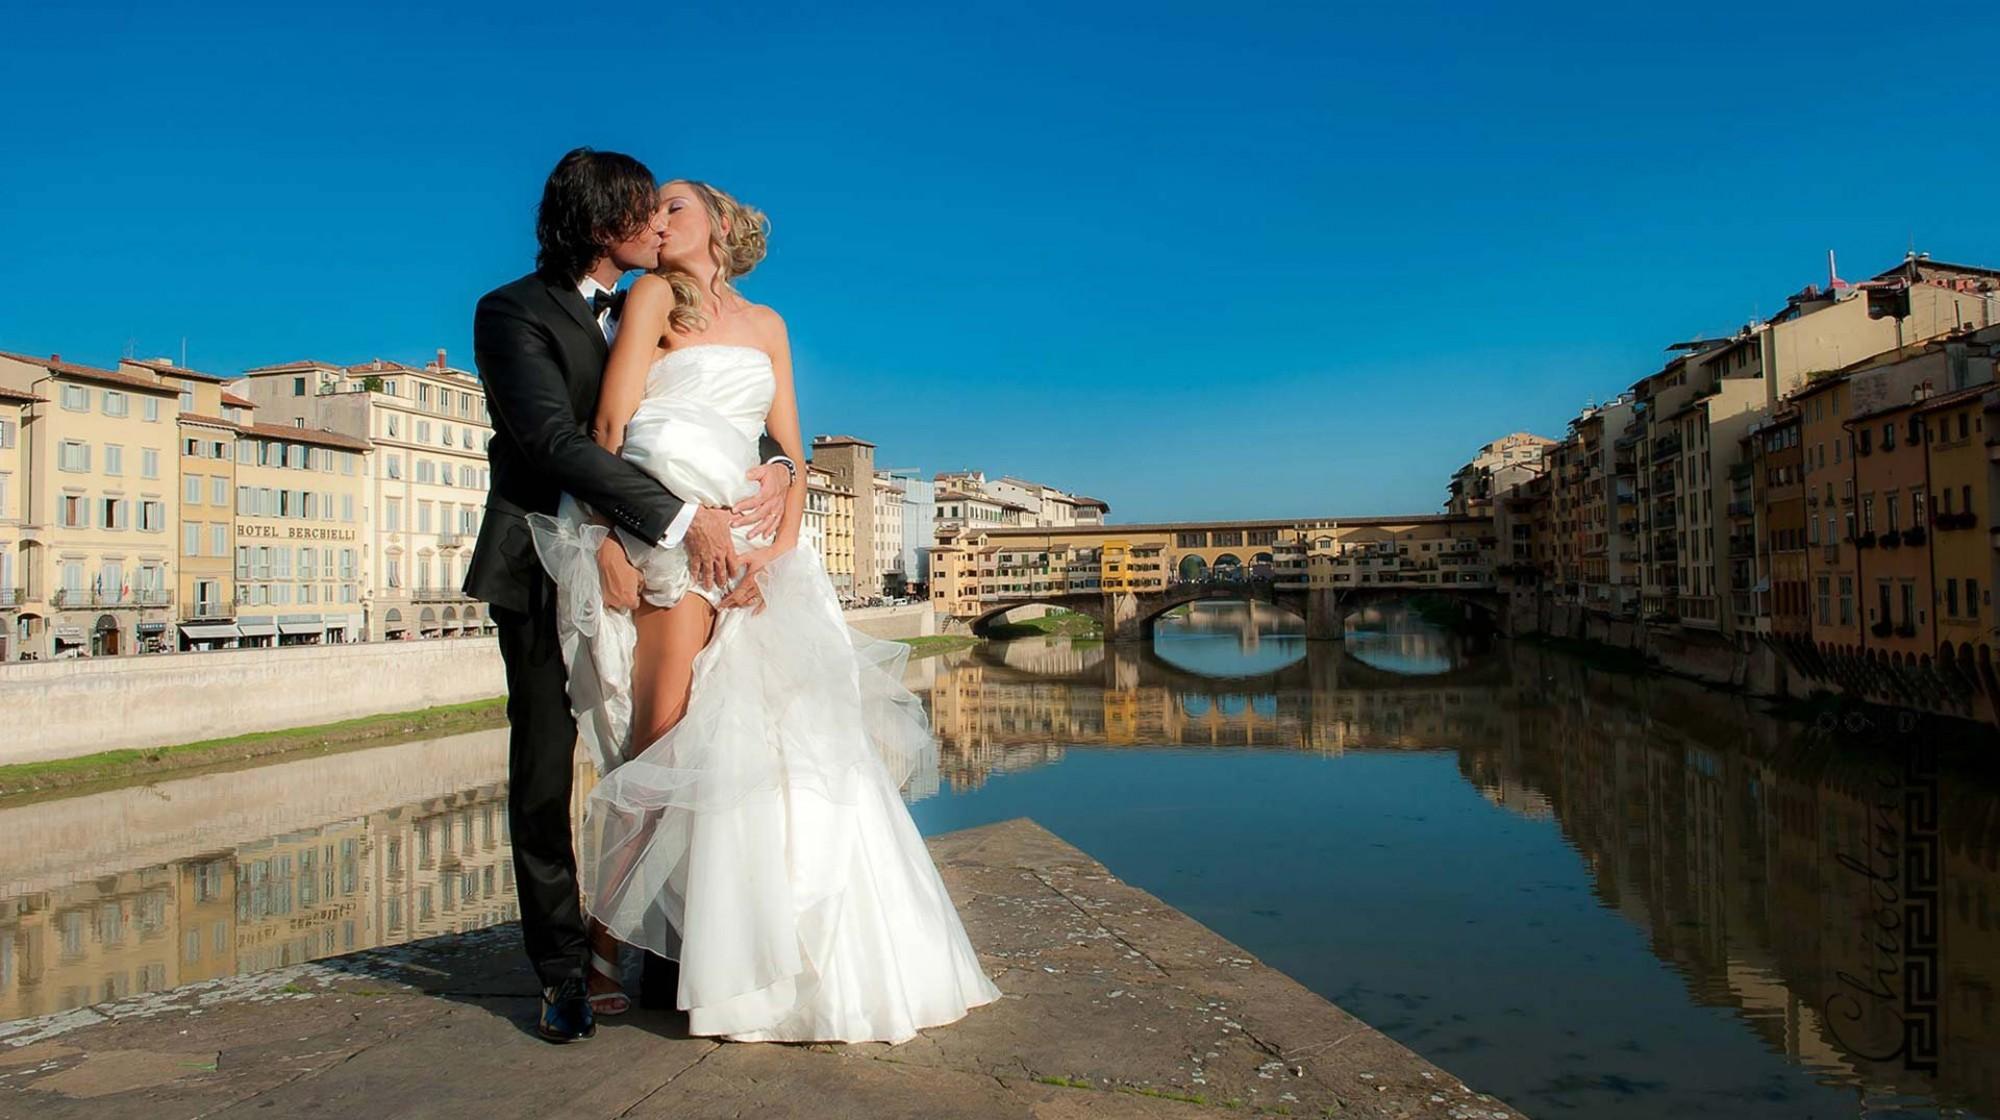 matrimonio ponte vecchio firenze veronica federico 2x1z8dpw24lo38yrikfwu8